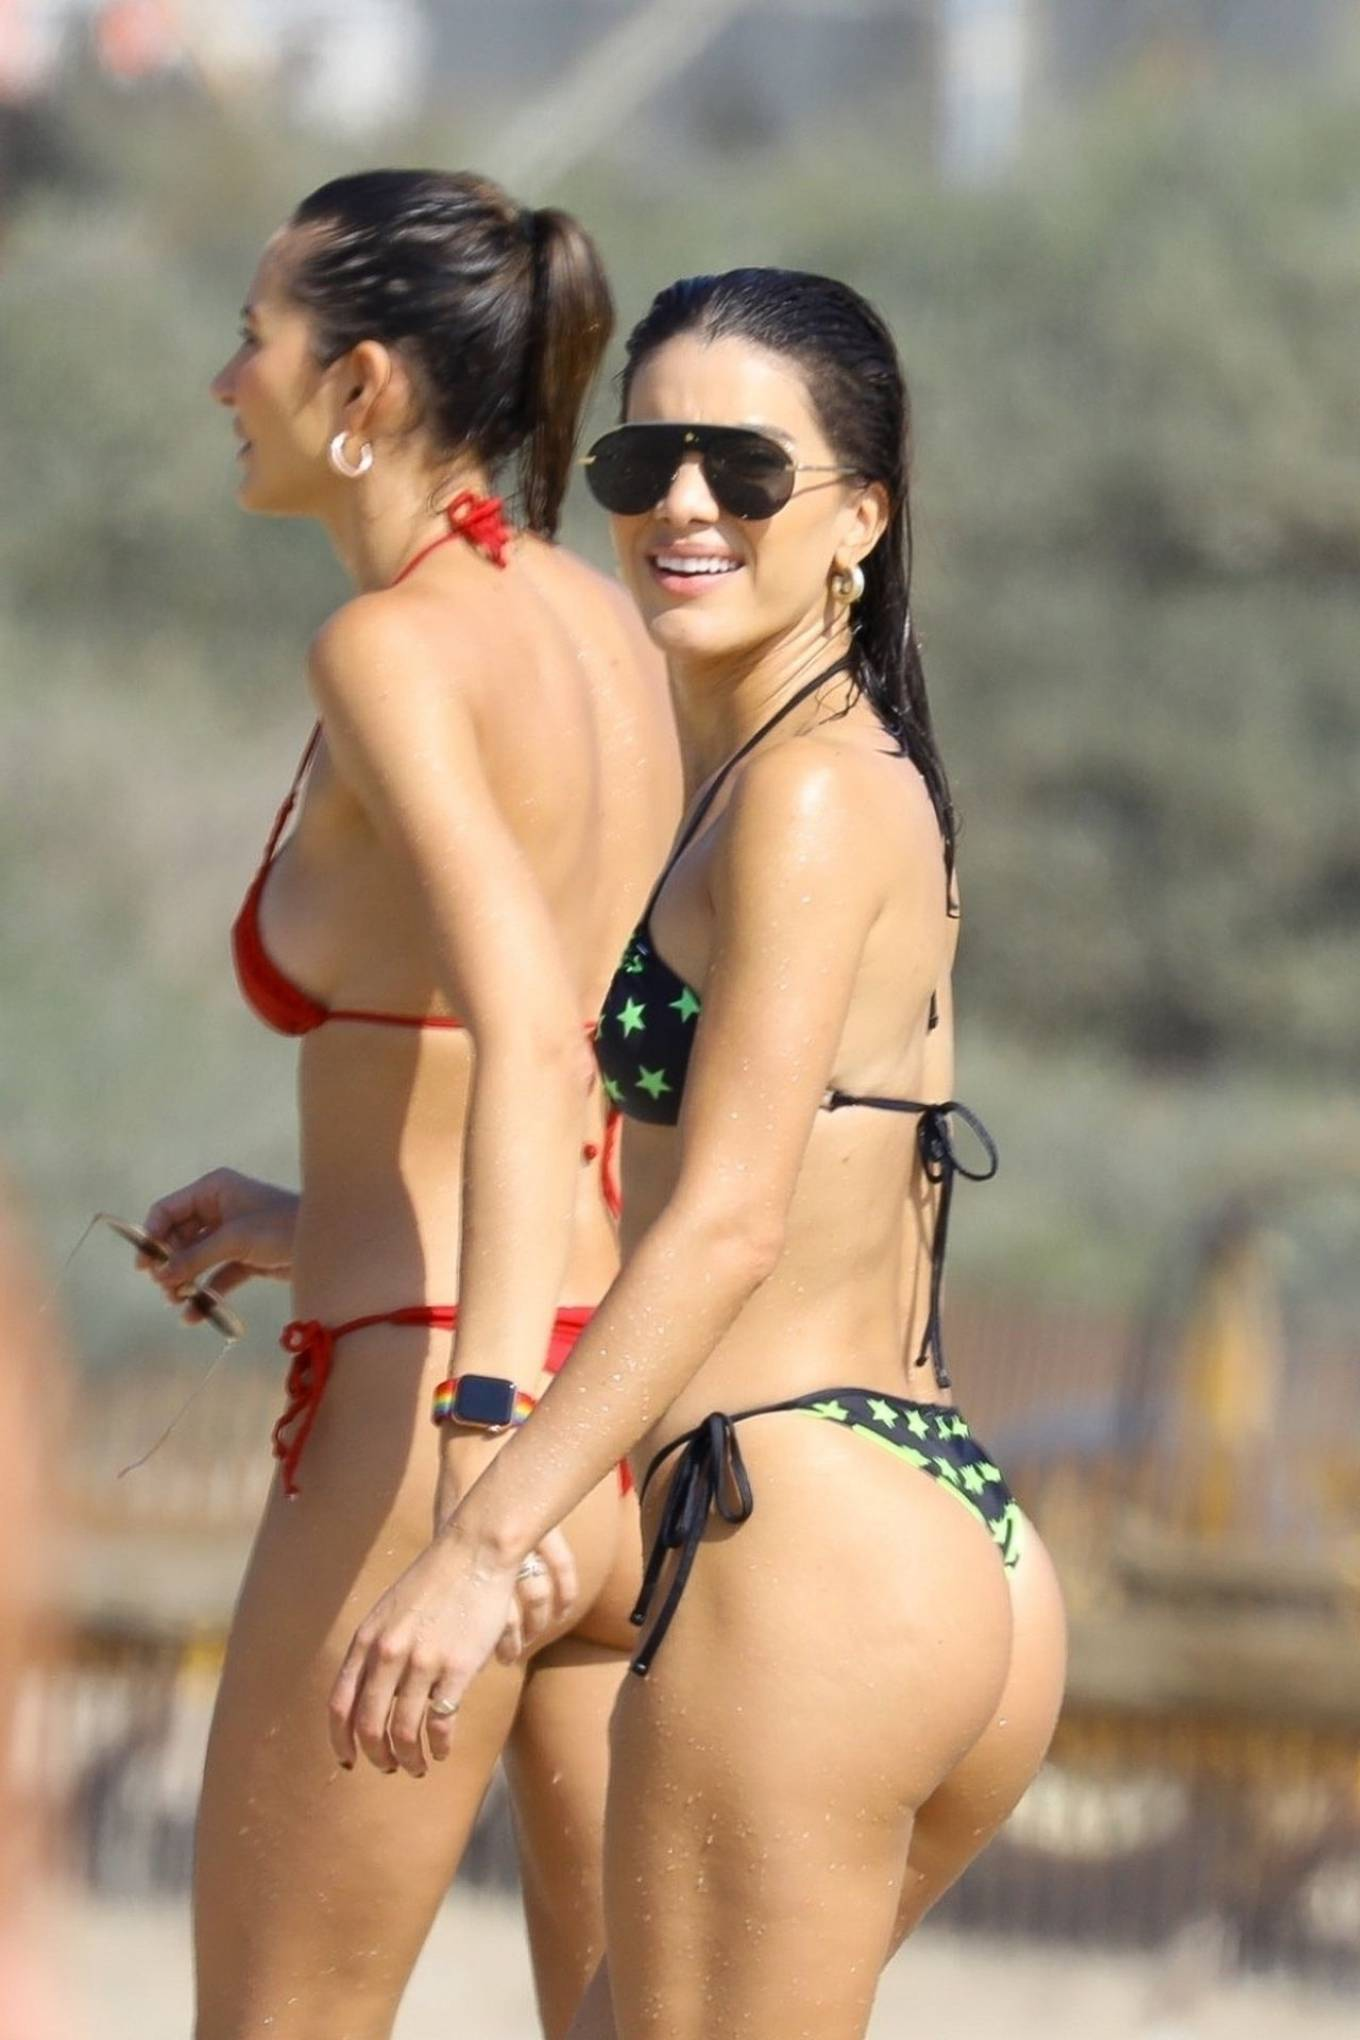 Camila Coelho rocking a plunging black bikini top with spaghetti straps